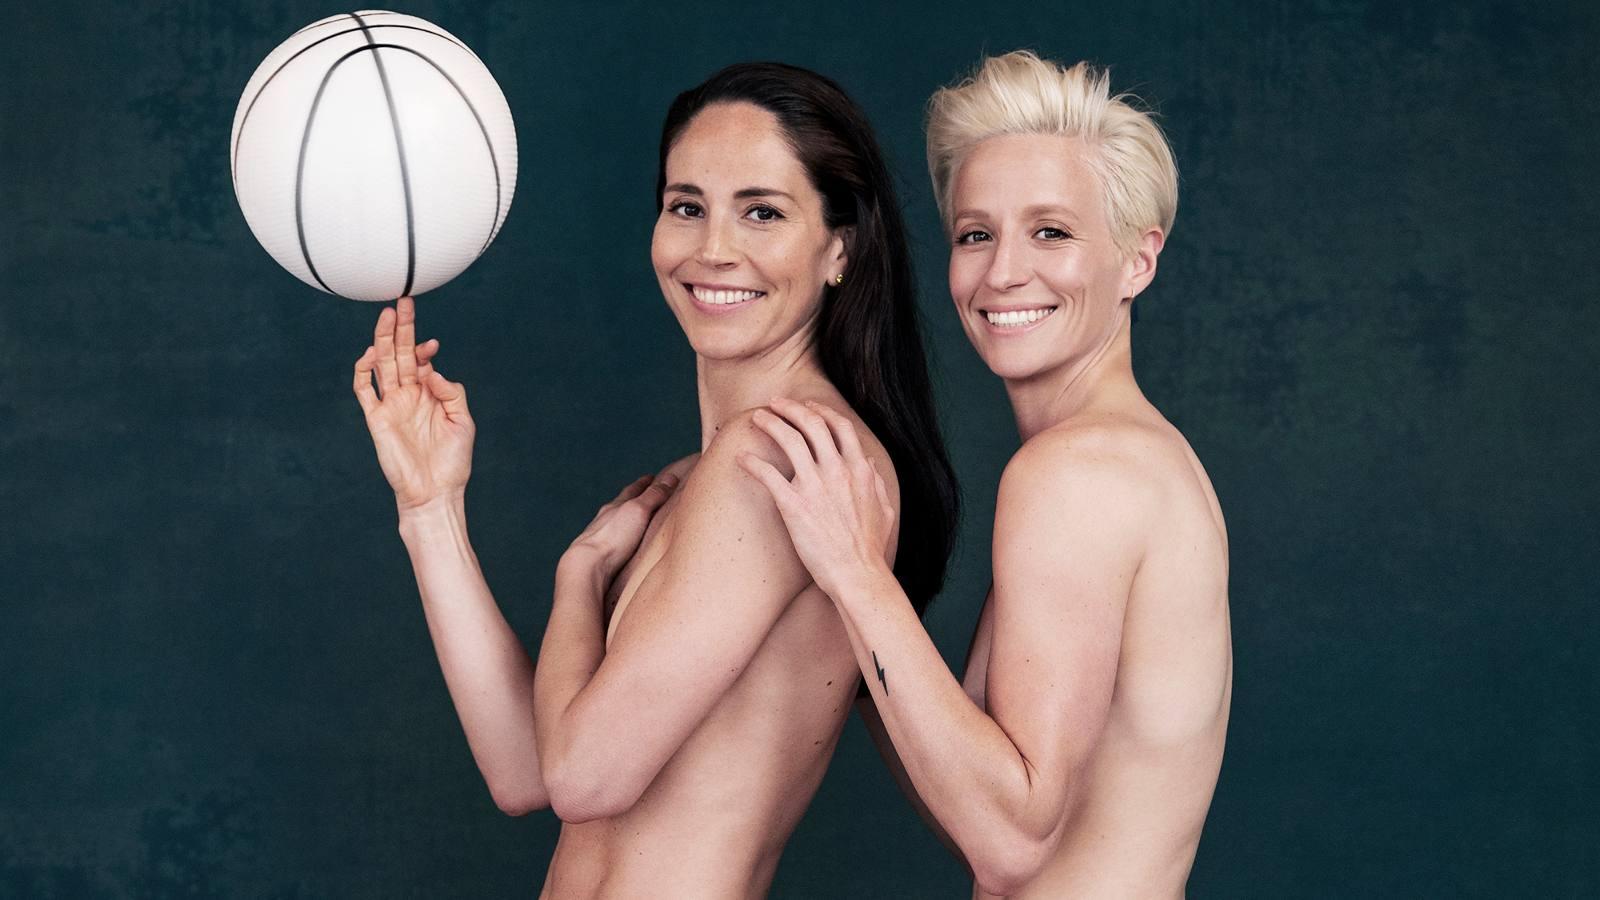 Sue Bird, Megan Rapinoe Nude 0006